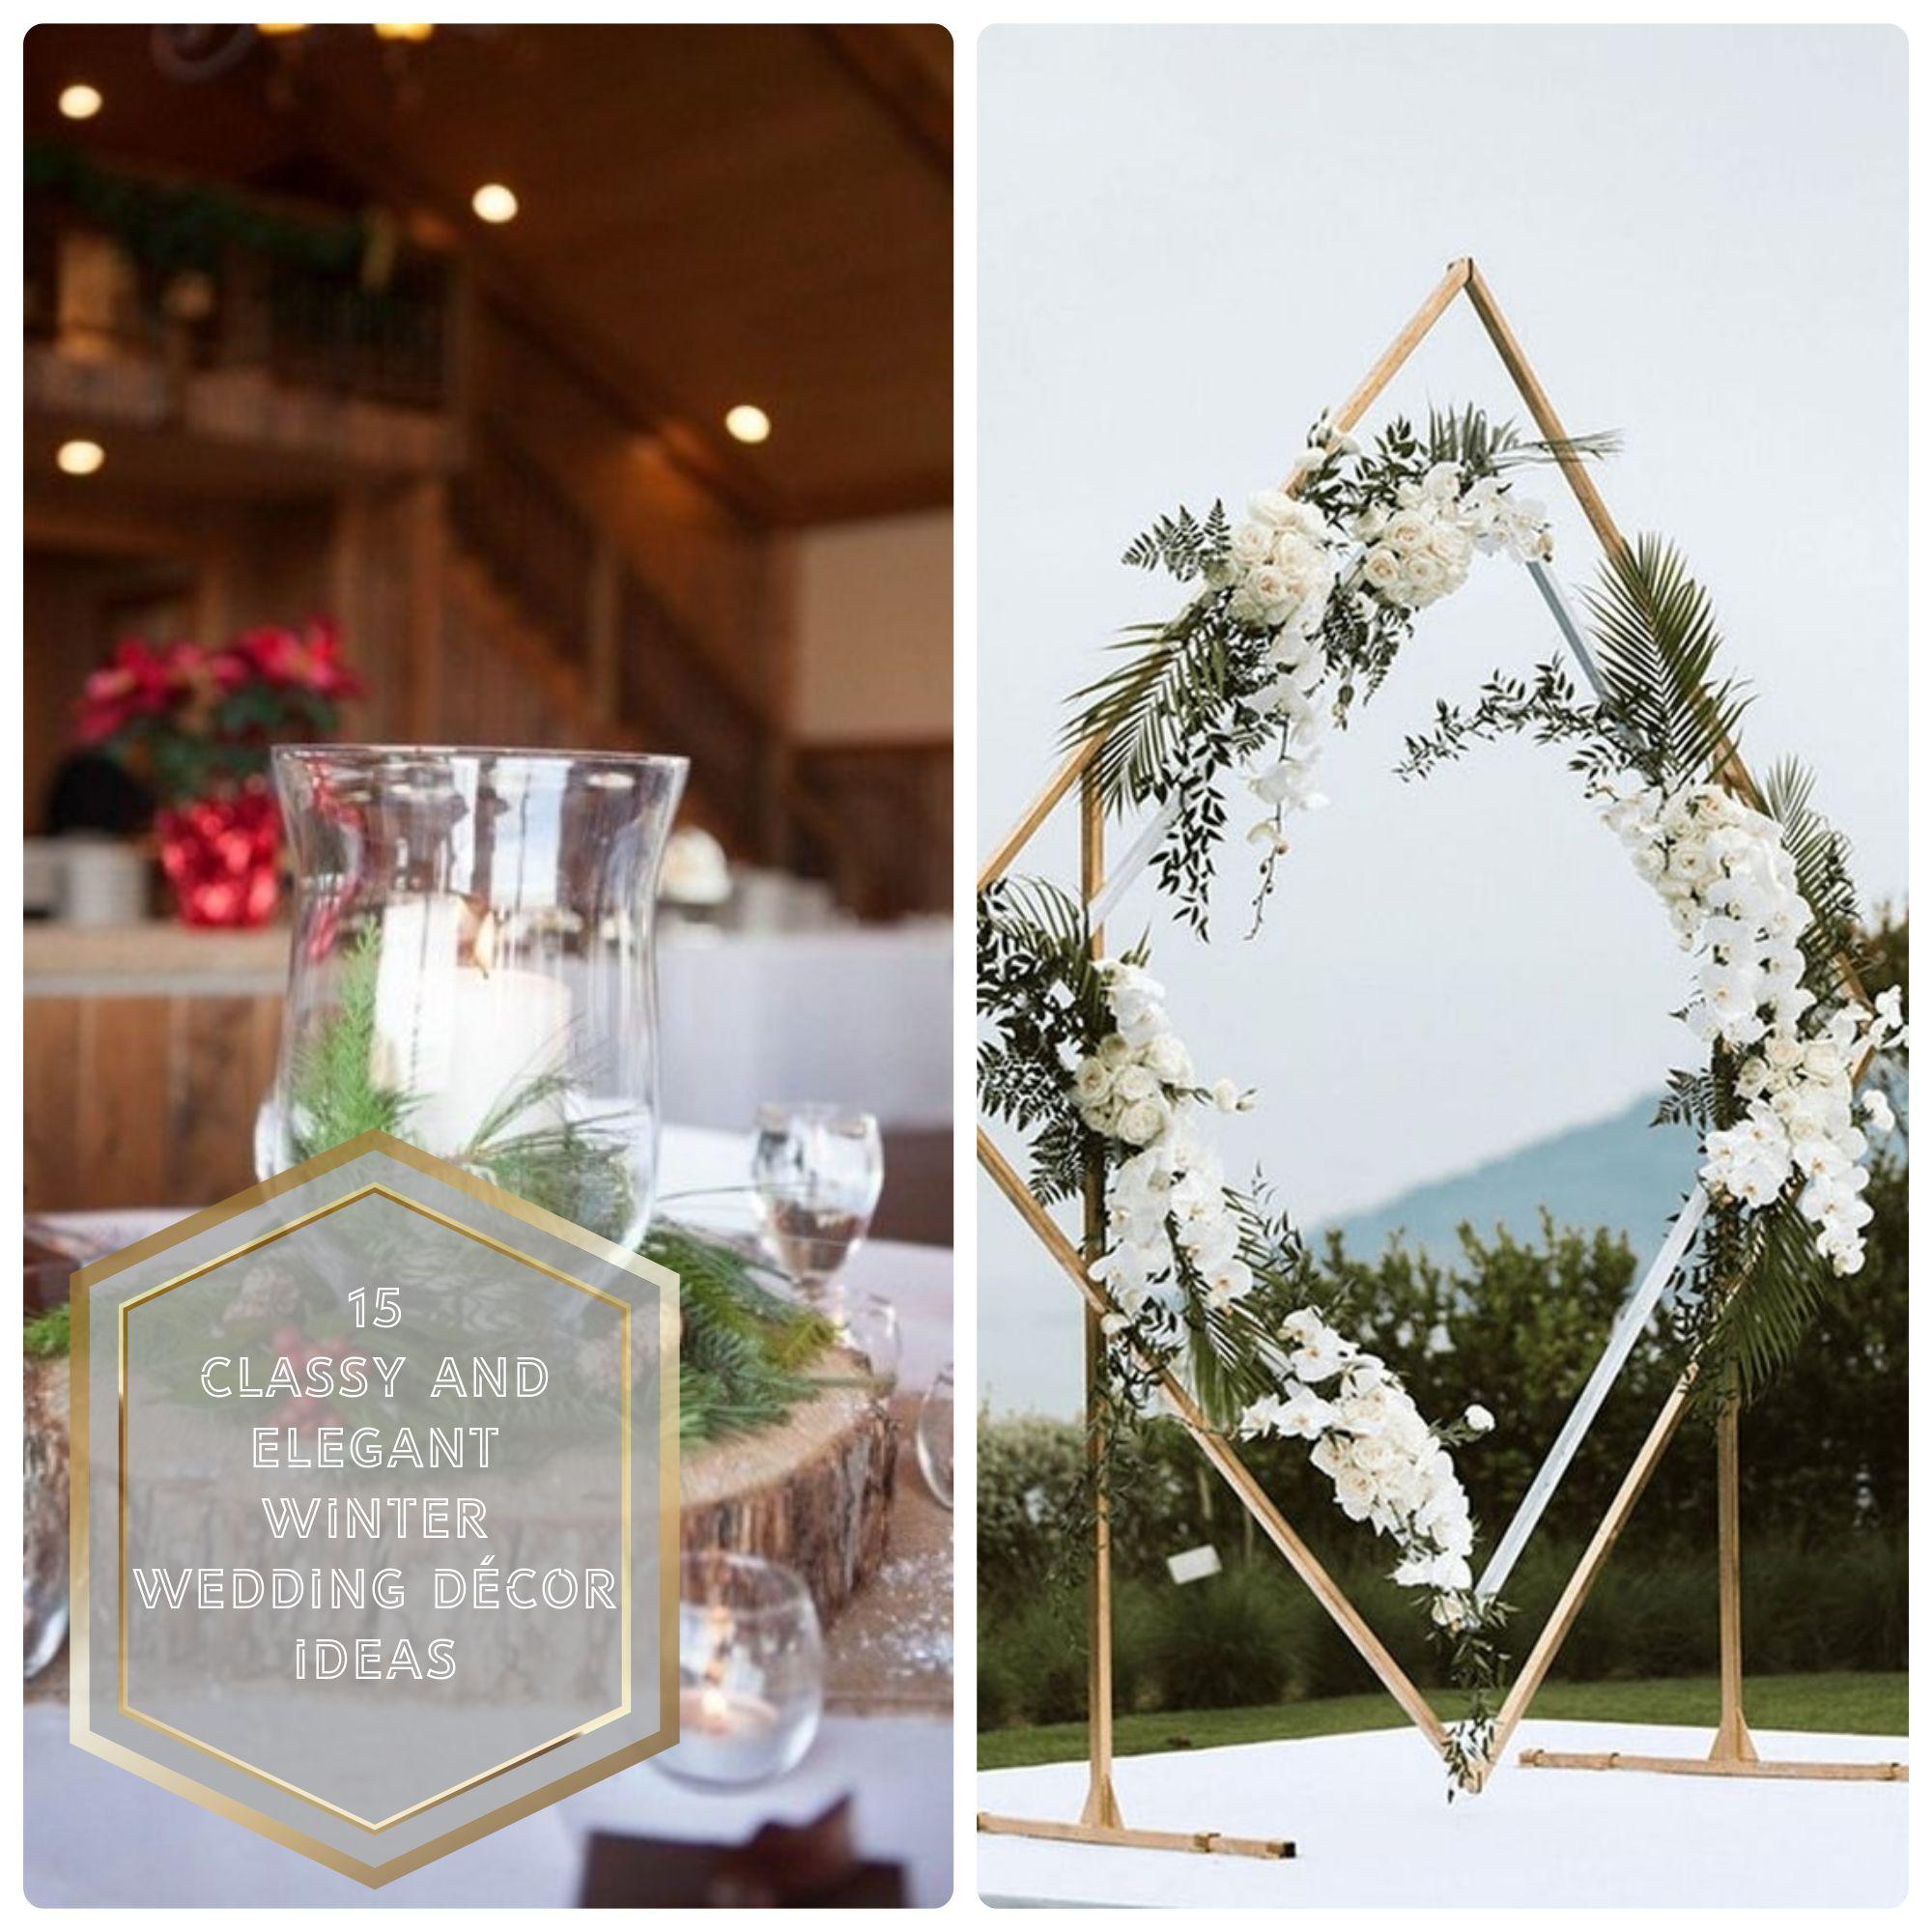 Winter Wedding Decor Ideas #weddingdecoration